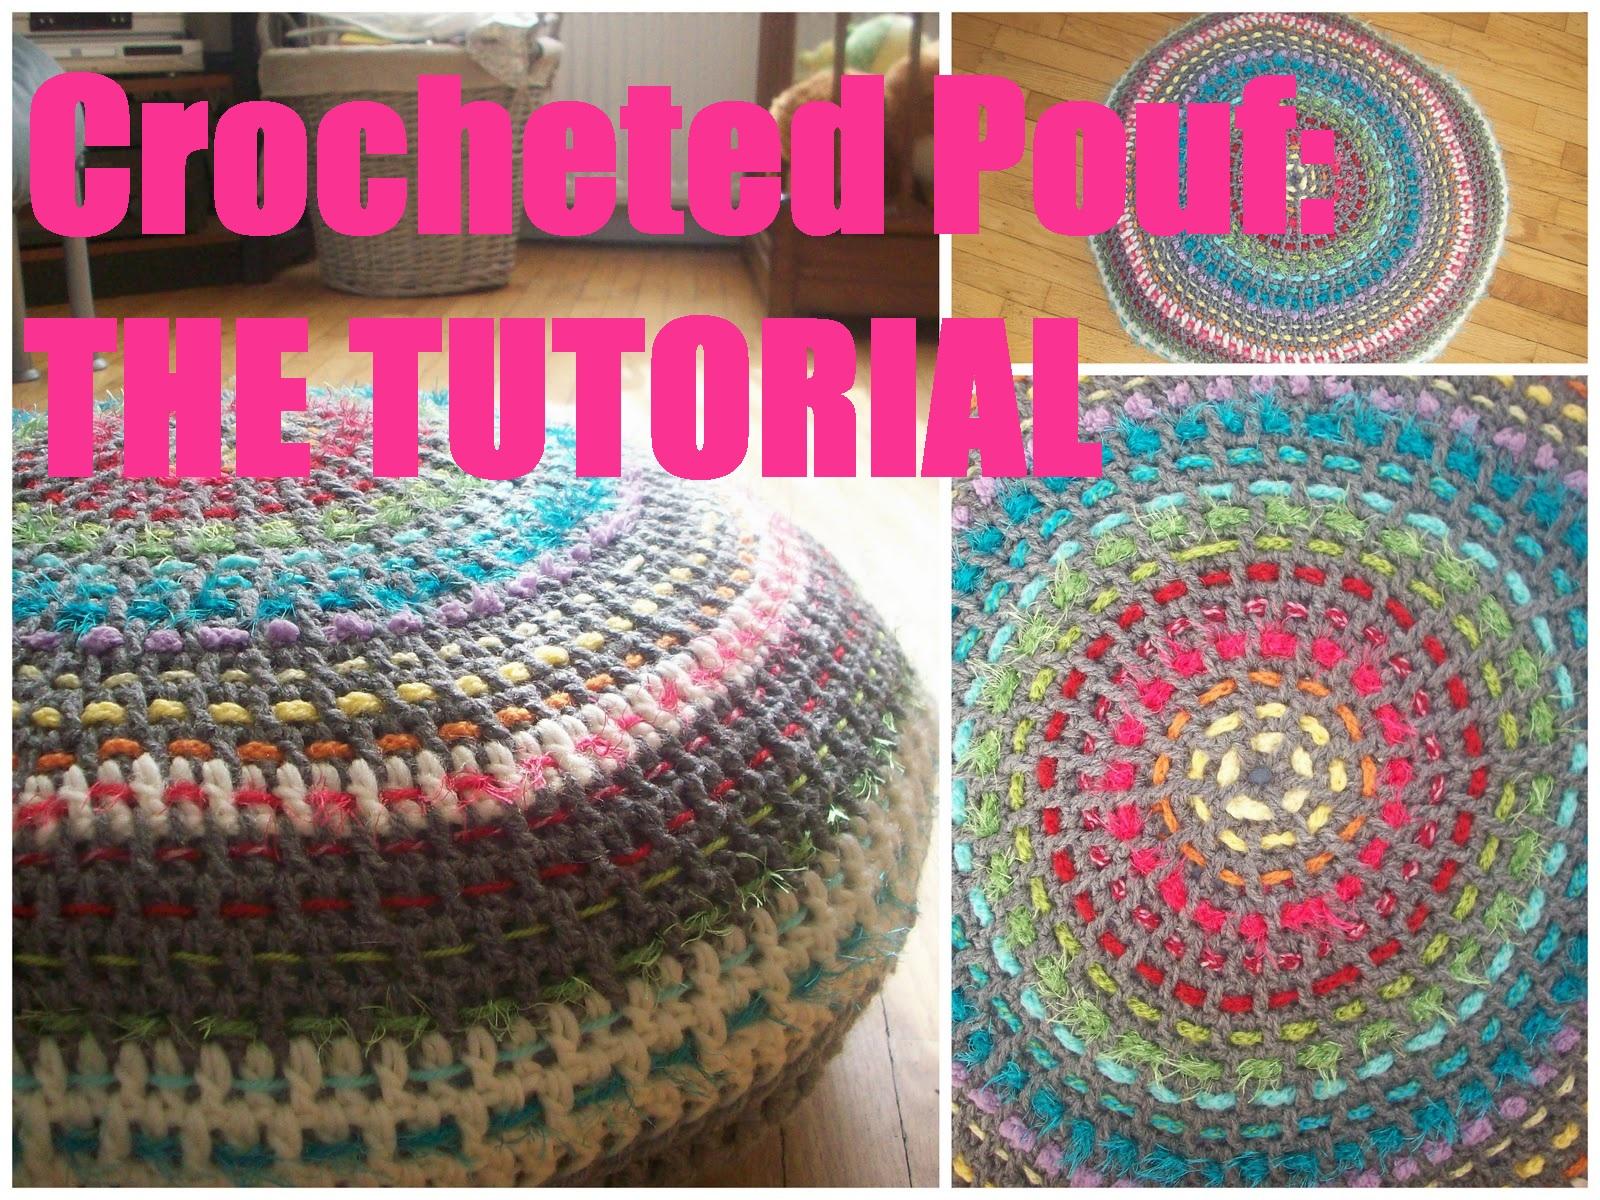 Gay crochet - Magazine cover